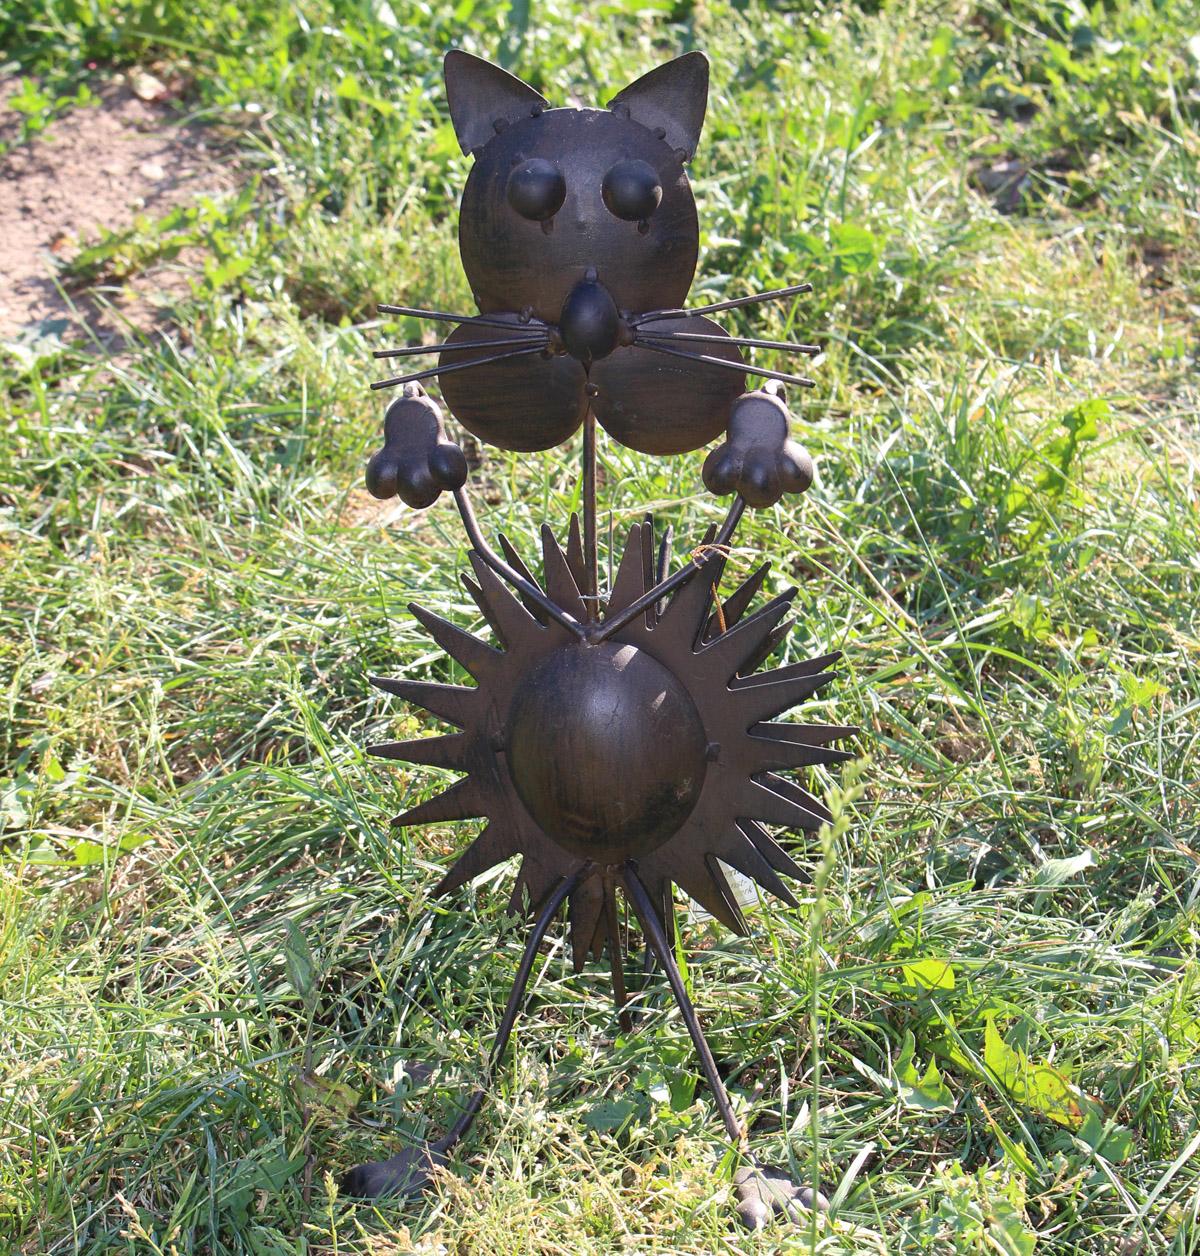 Katzenfigur aus metall dekor garten for Dekor garten schirrle